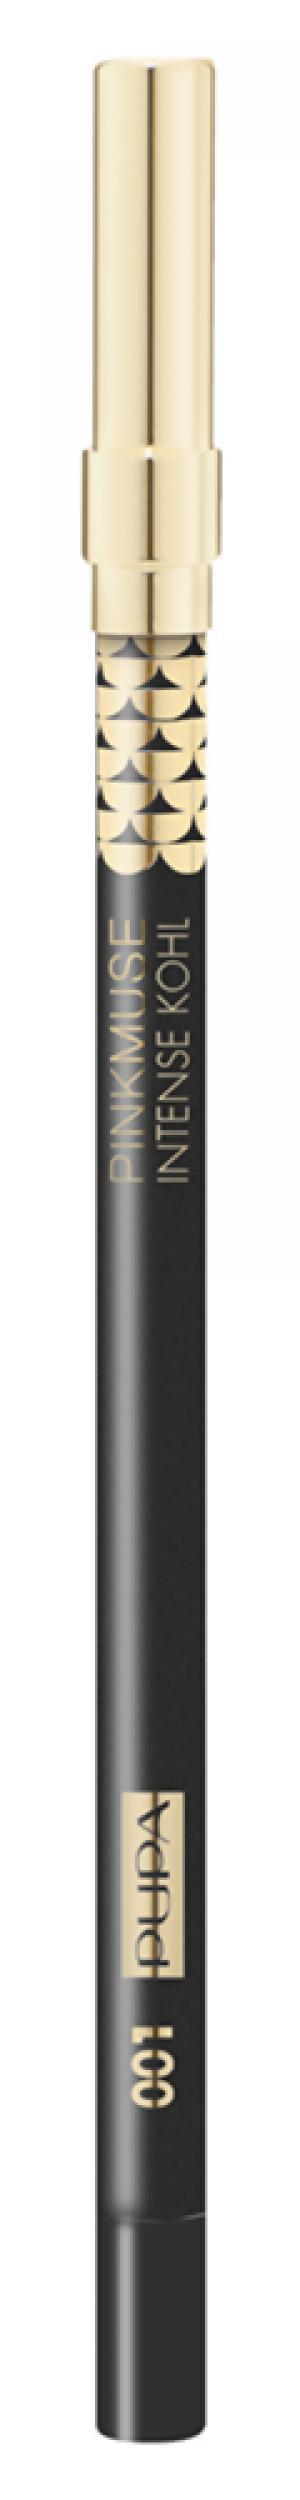 Карандаш для глаз Pupa 001 Extra Black. Цвет: 001 extra black